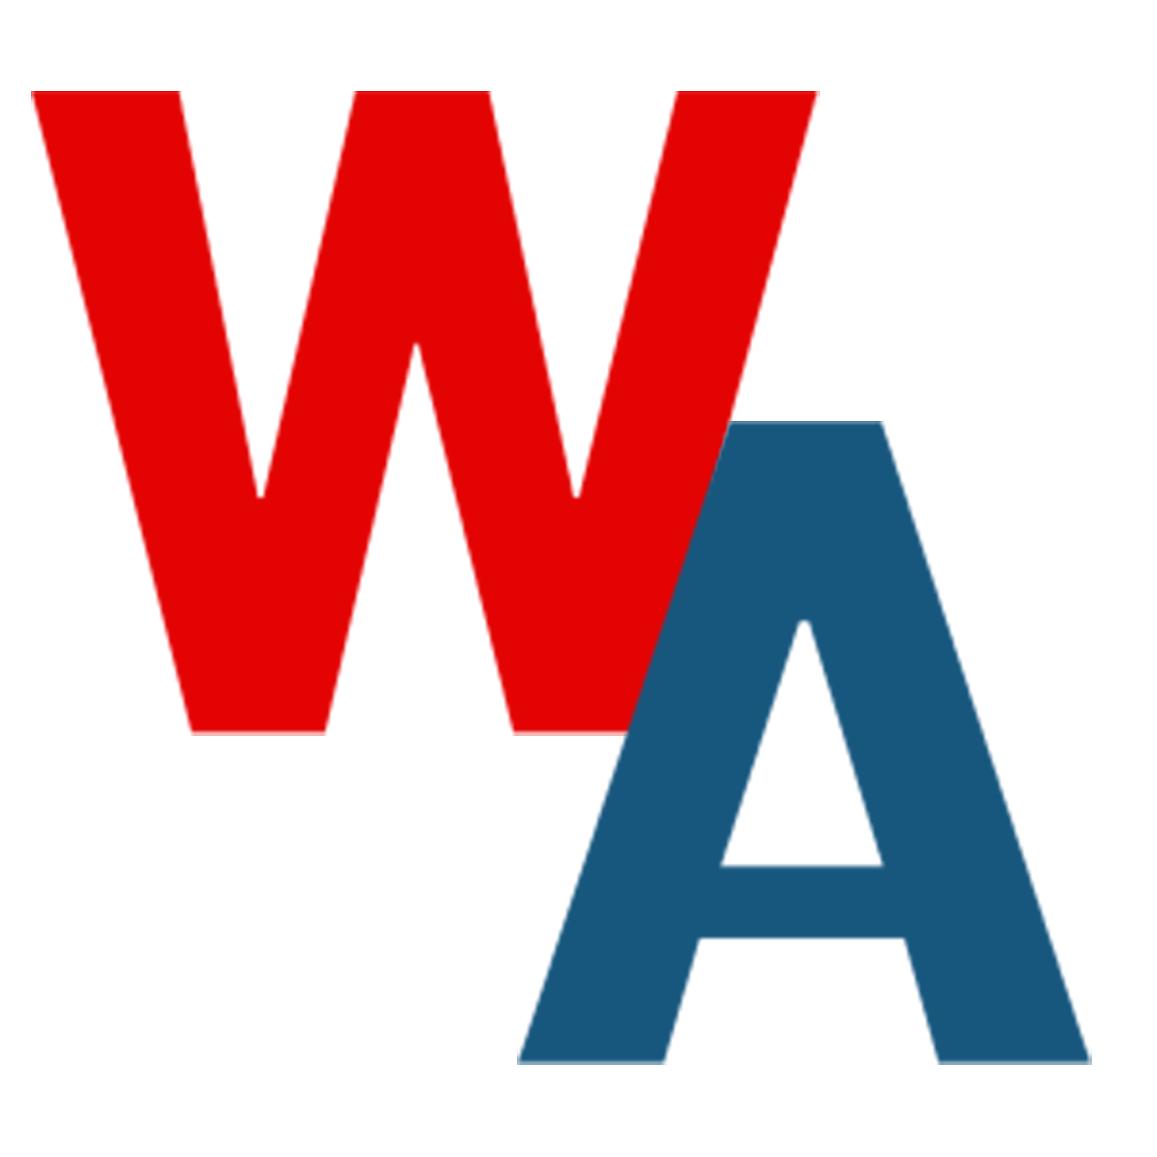 Westerville Automotive - Westerville, OH - General Auto Repair & Service